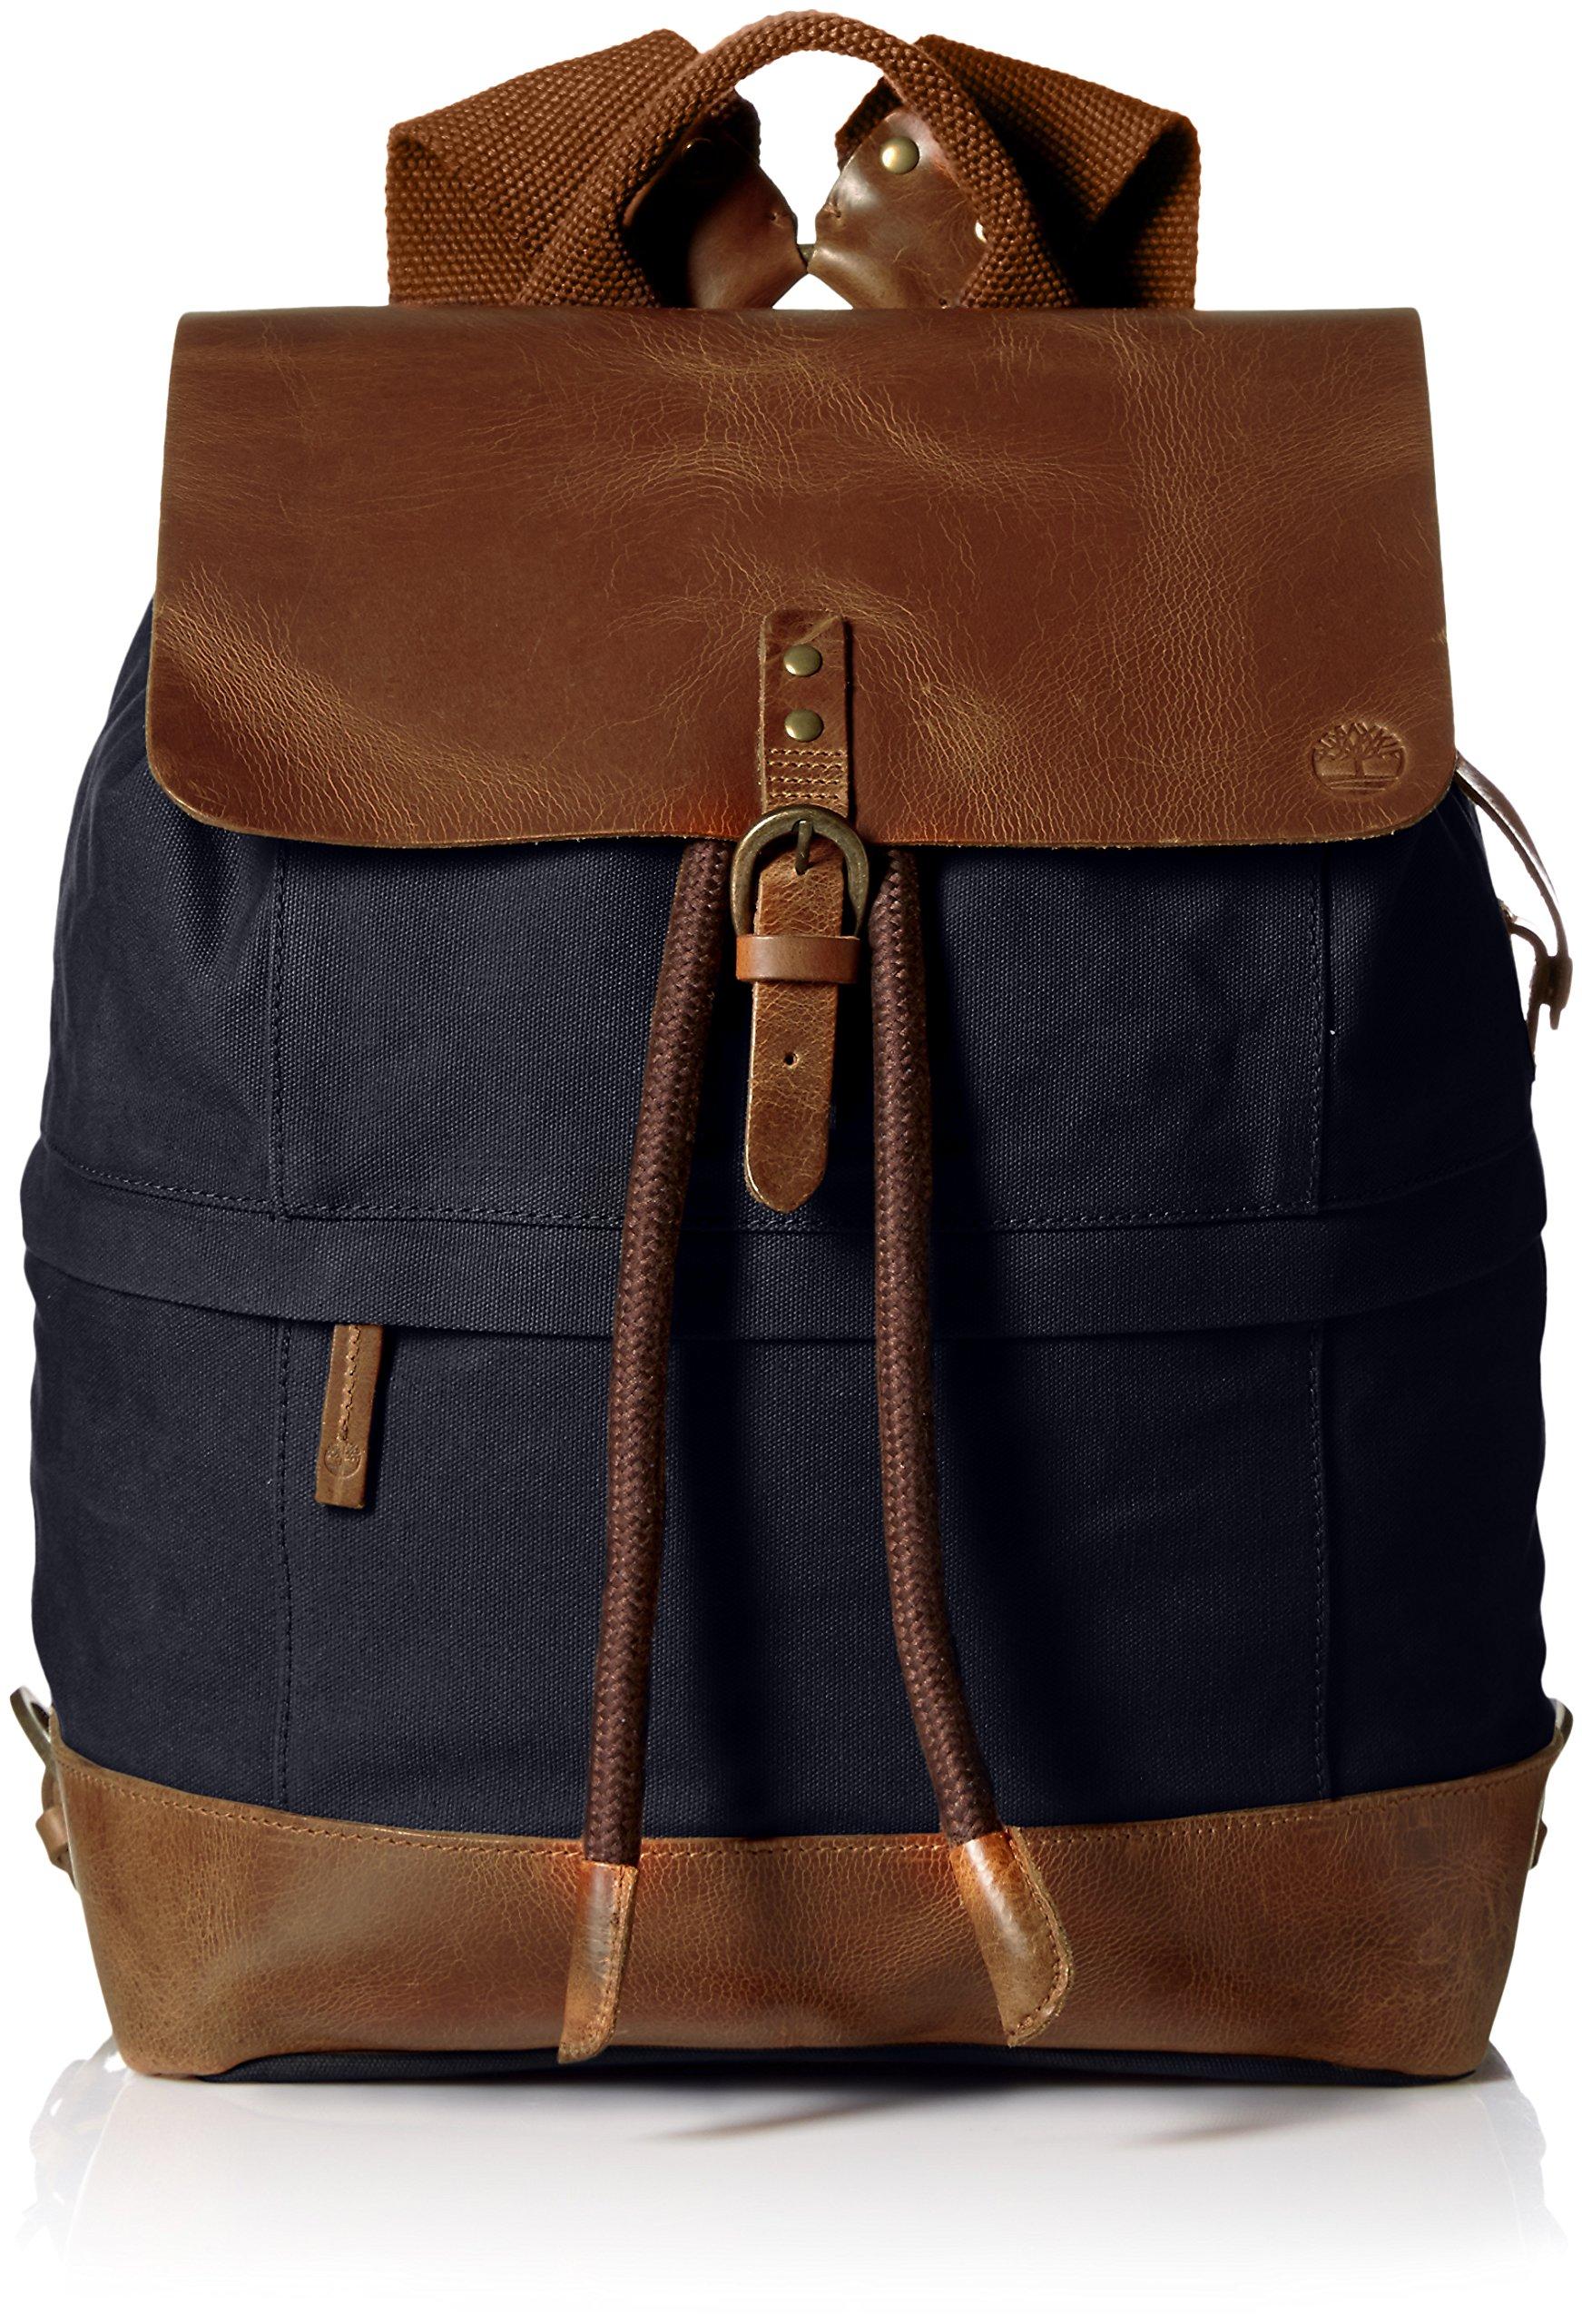 Timberland Men's Nantakset Backpack, Black Iris